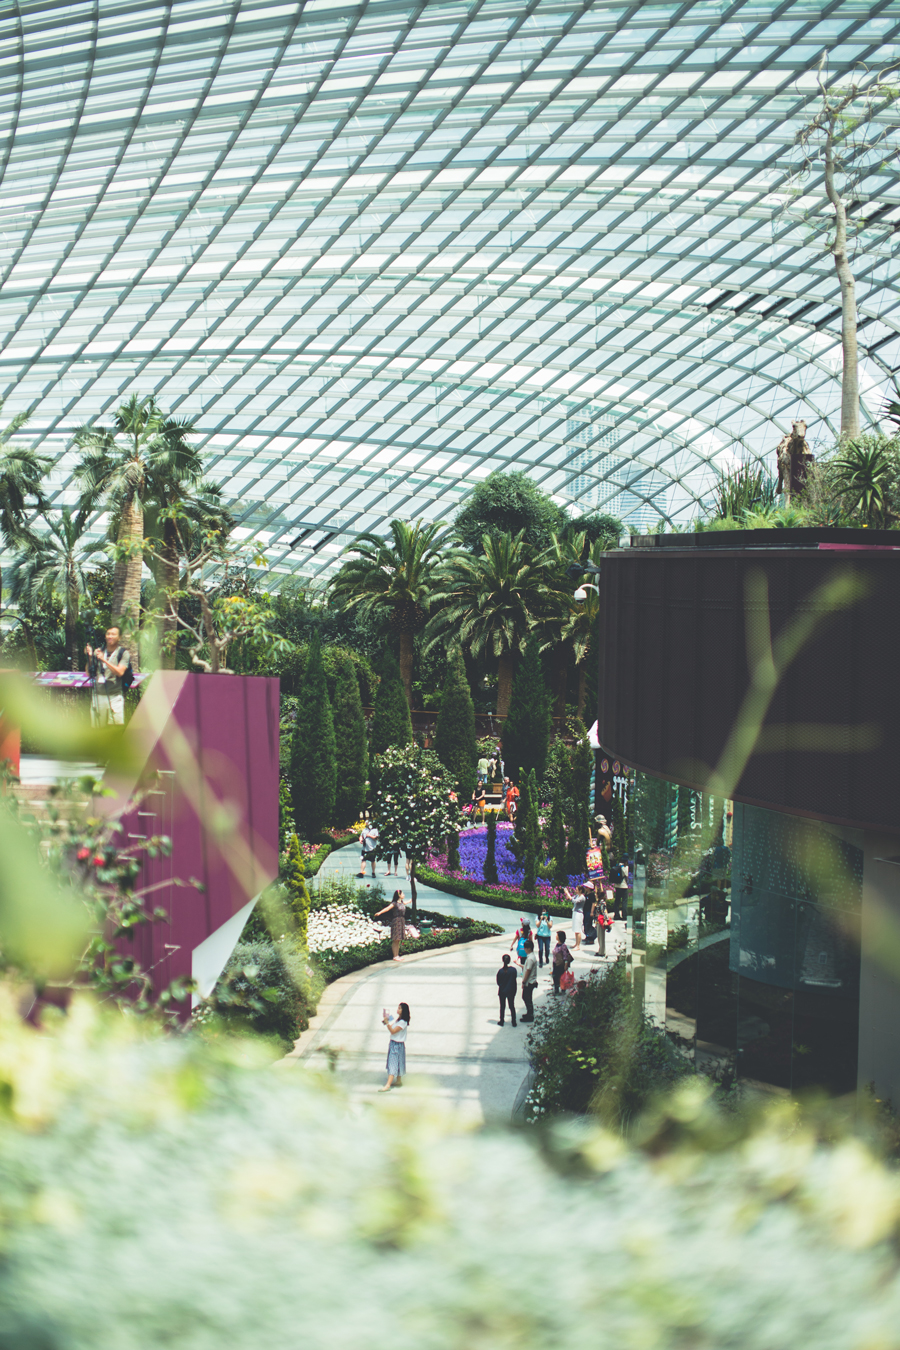 Singapore-150324-175